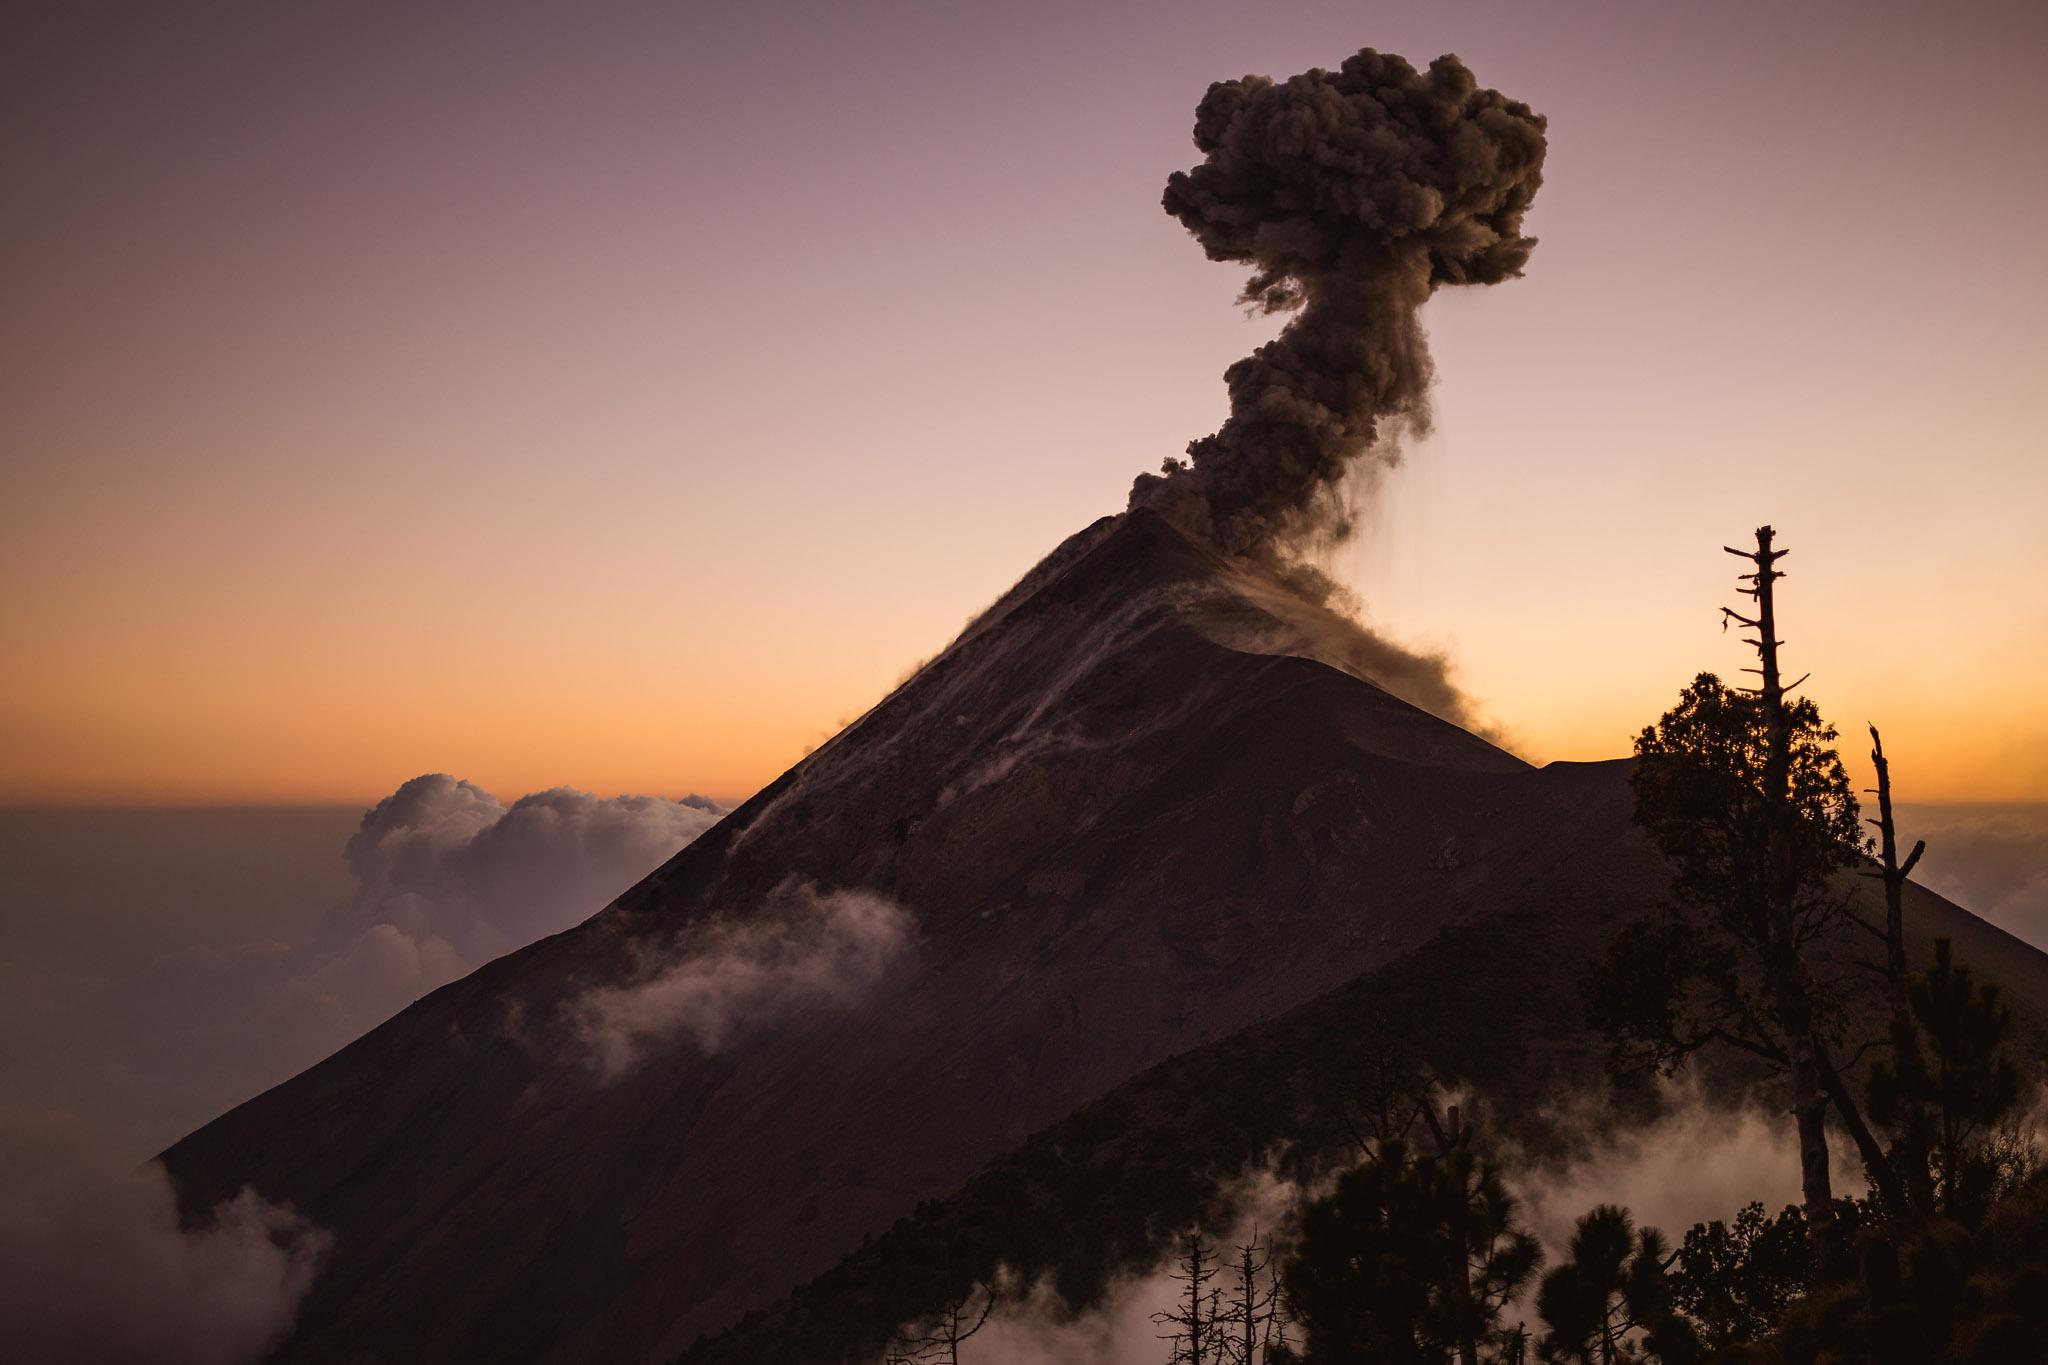 acatenango-volcan-fuego-guatemala-active-eruption-overlanding-vanlife-2.jpg